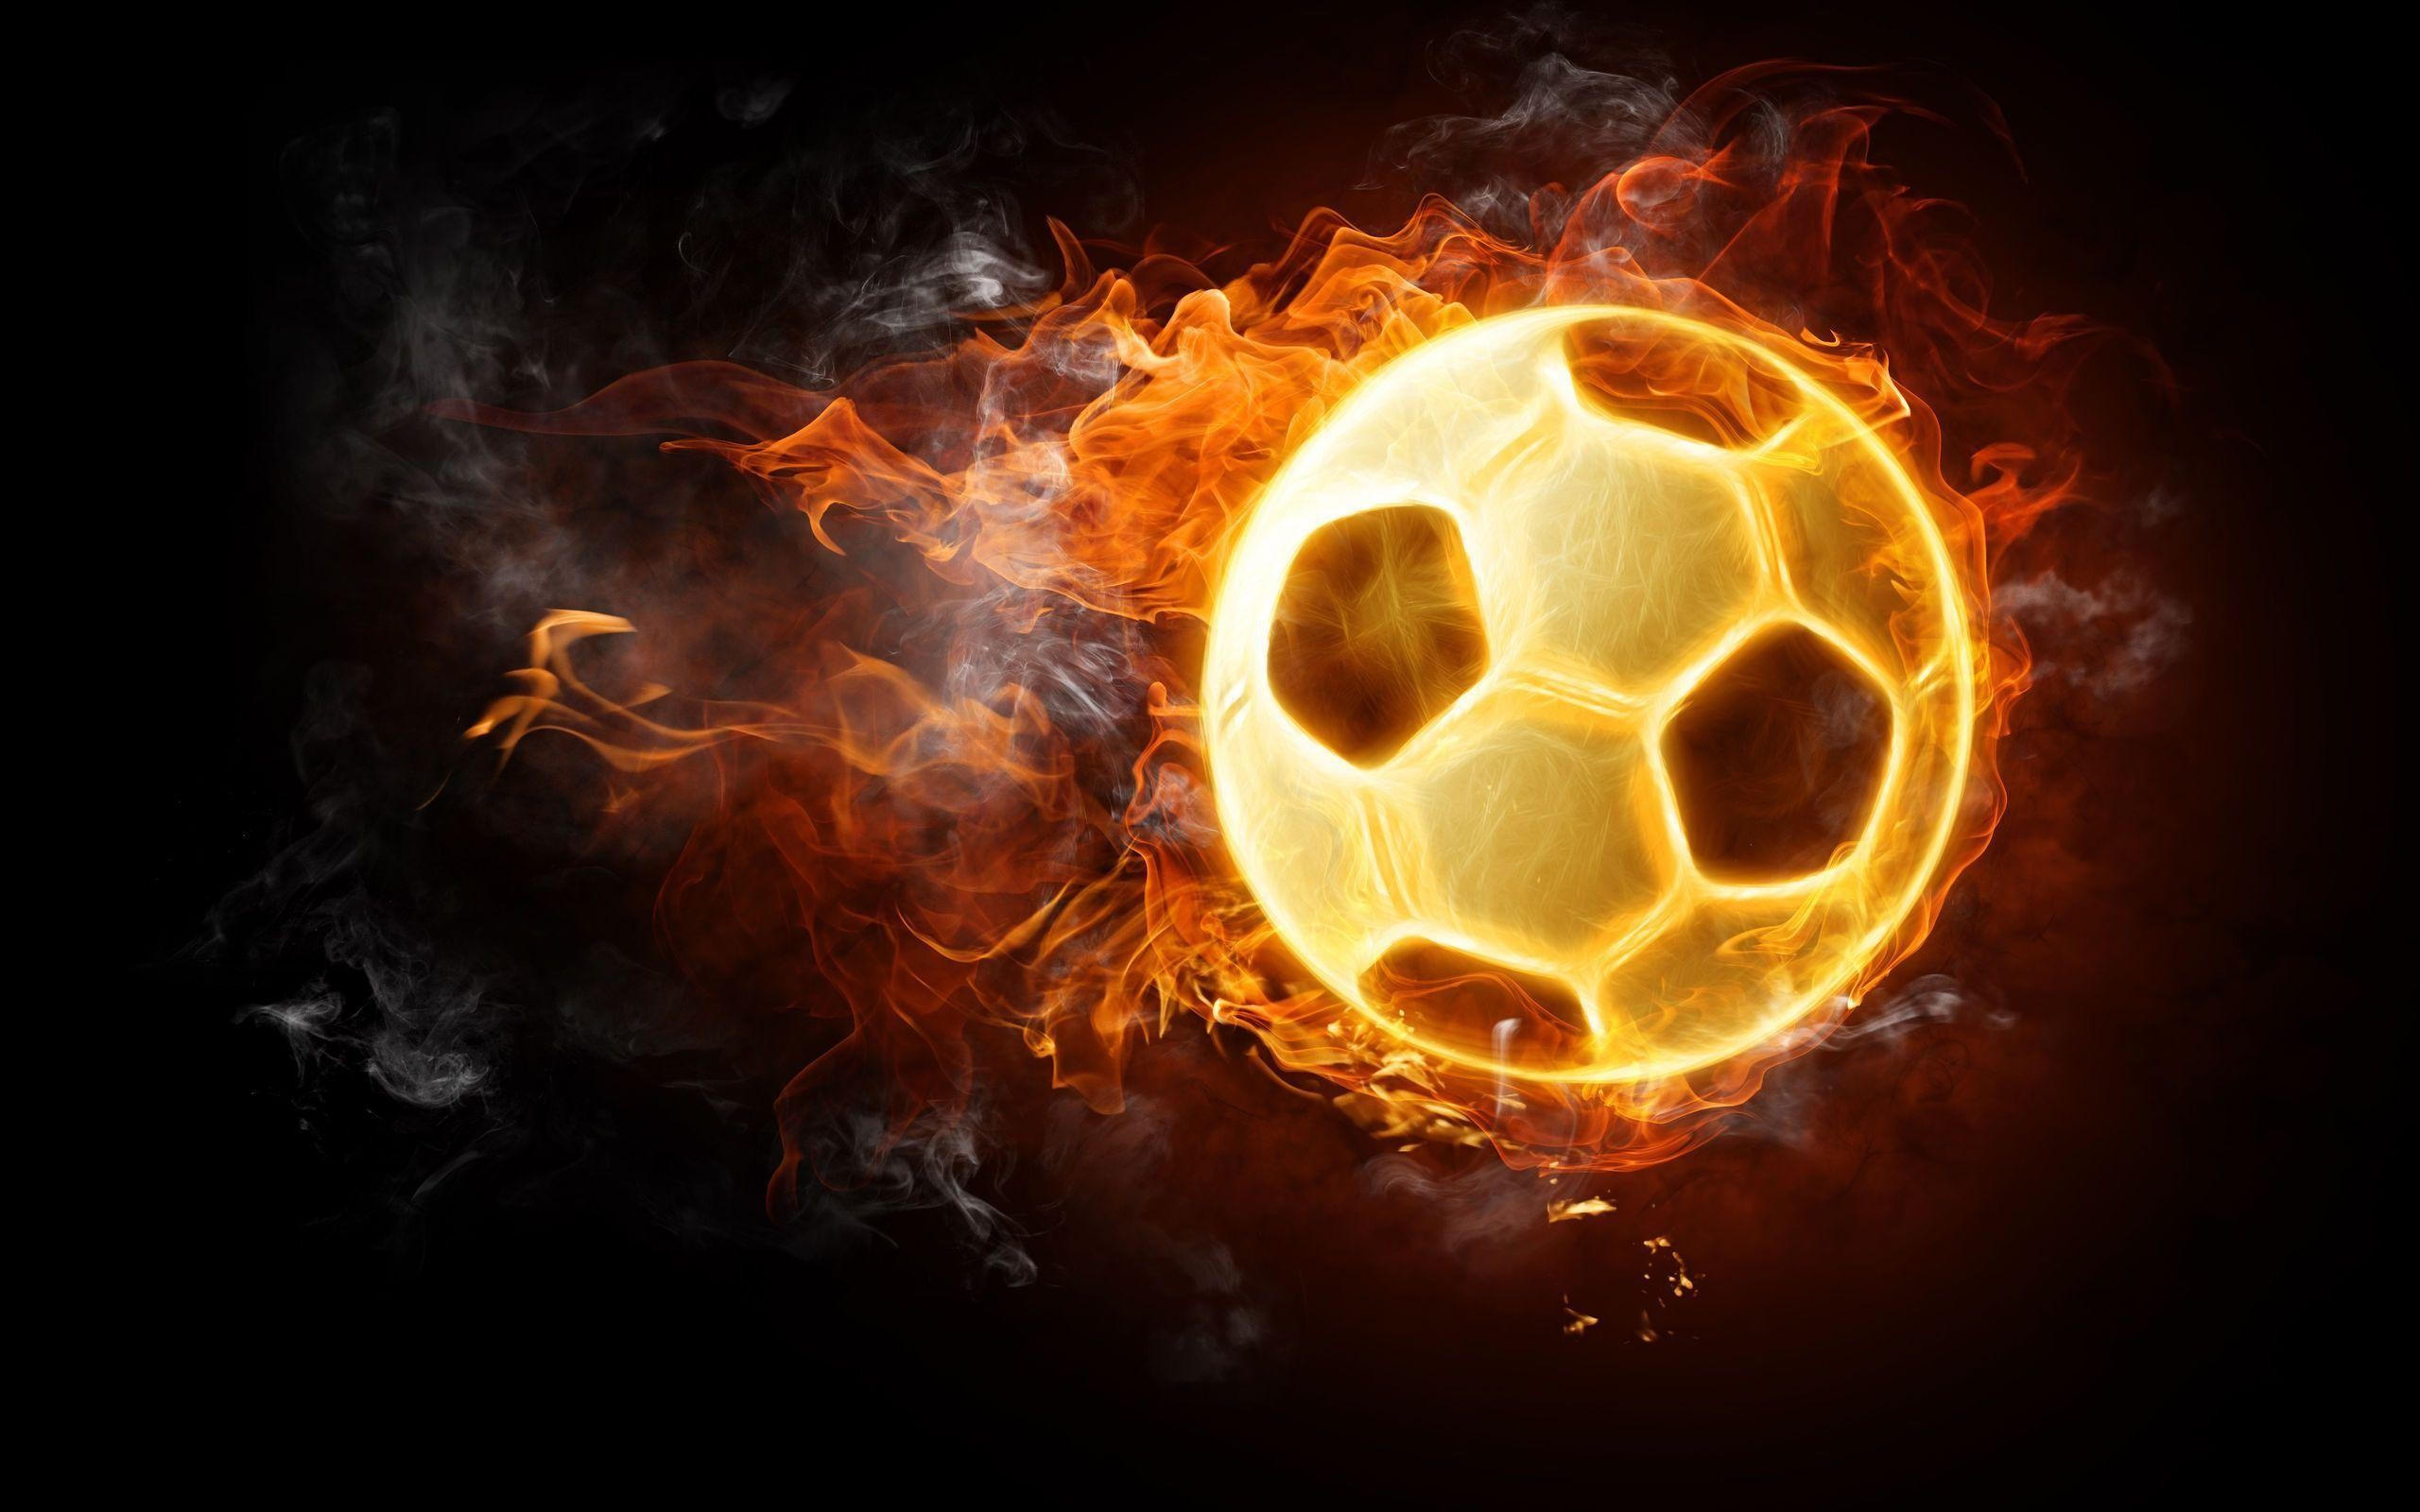 Animated Fire Soccer Ball Wallpaper #4759 #14183 Wallpaper | SpotIMG